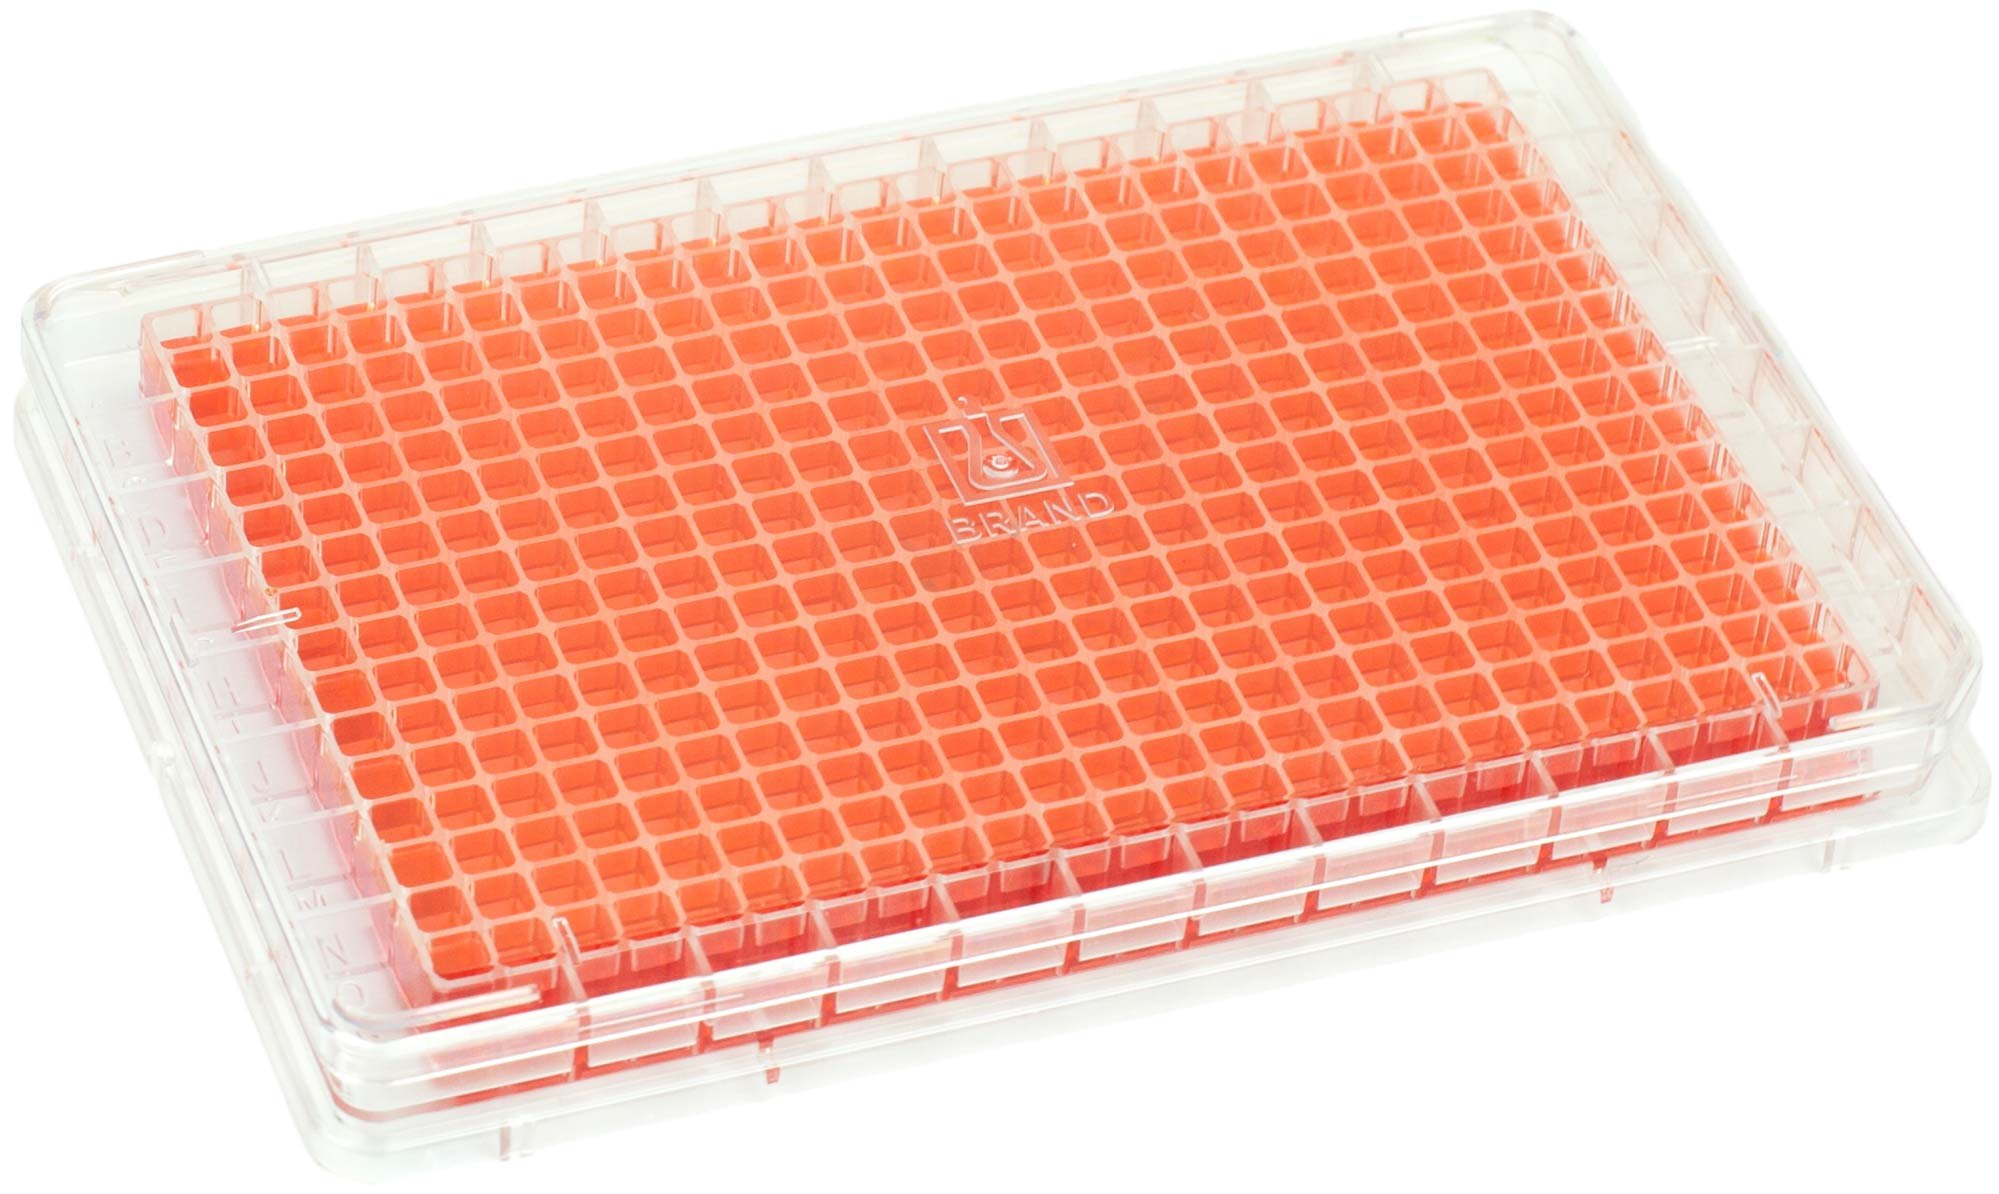 BRANDplates pureGrade S Non-Treated Sterile Surface 384-Well Plate - Transparent, F-Bottom